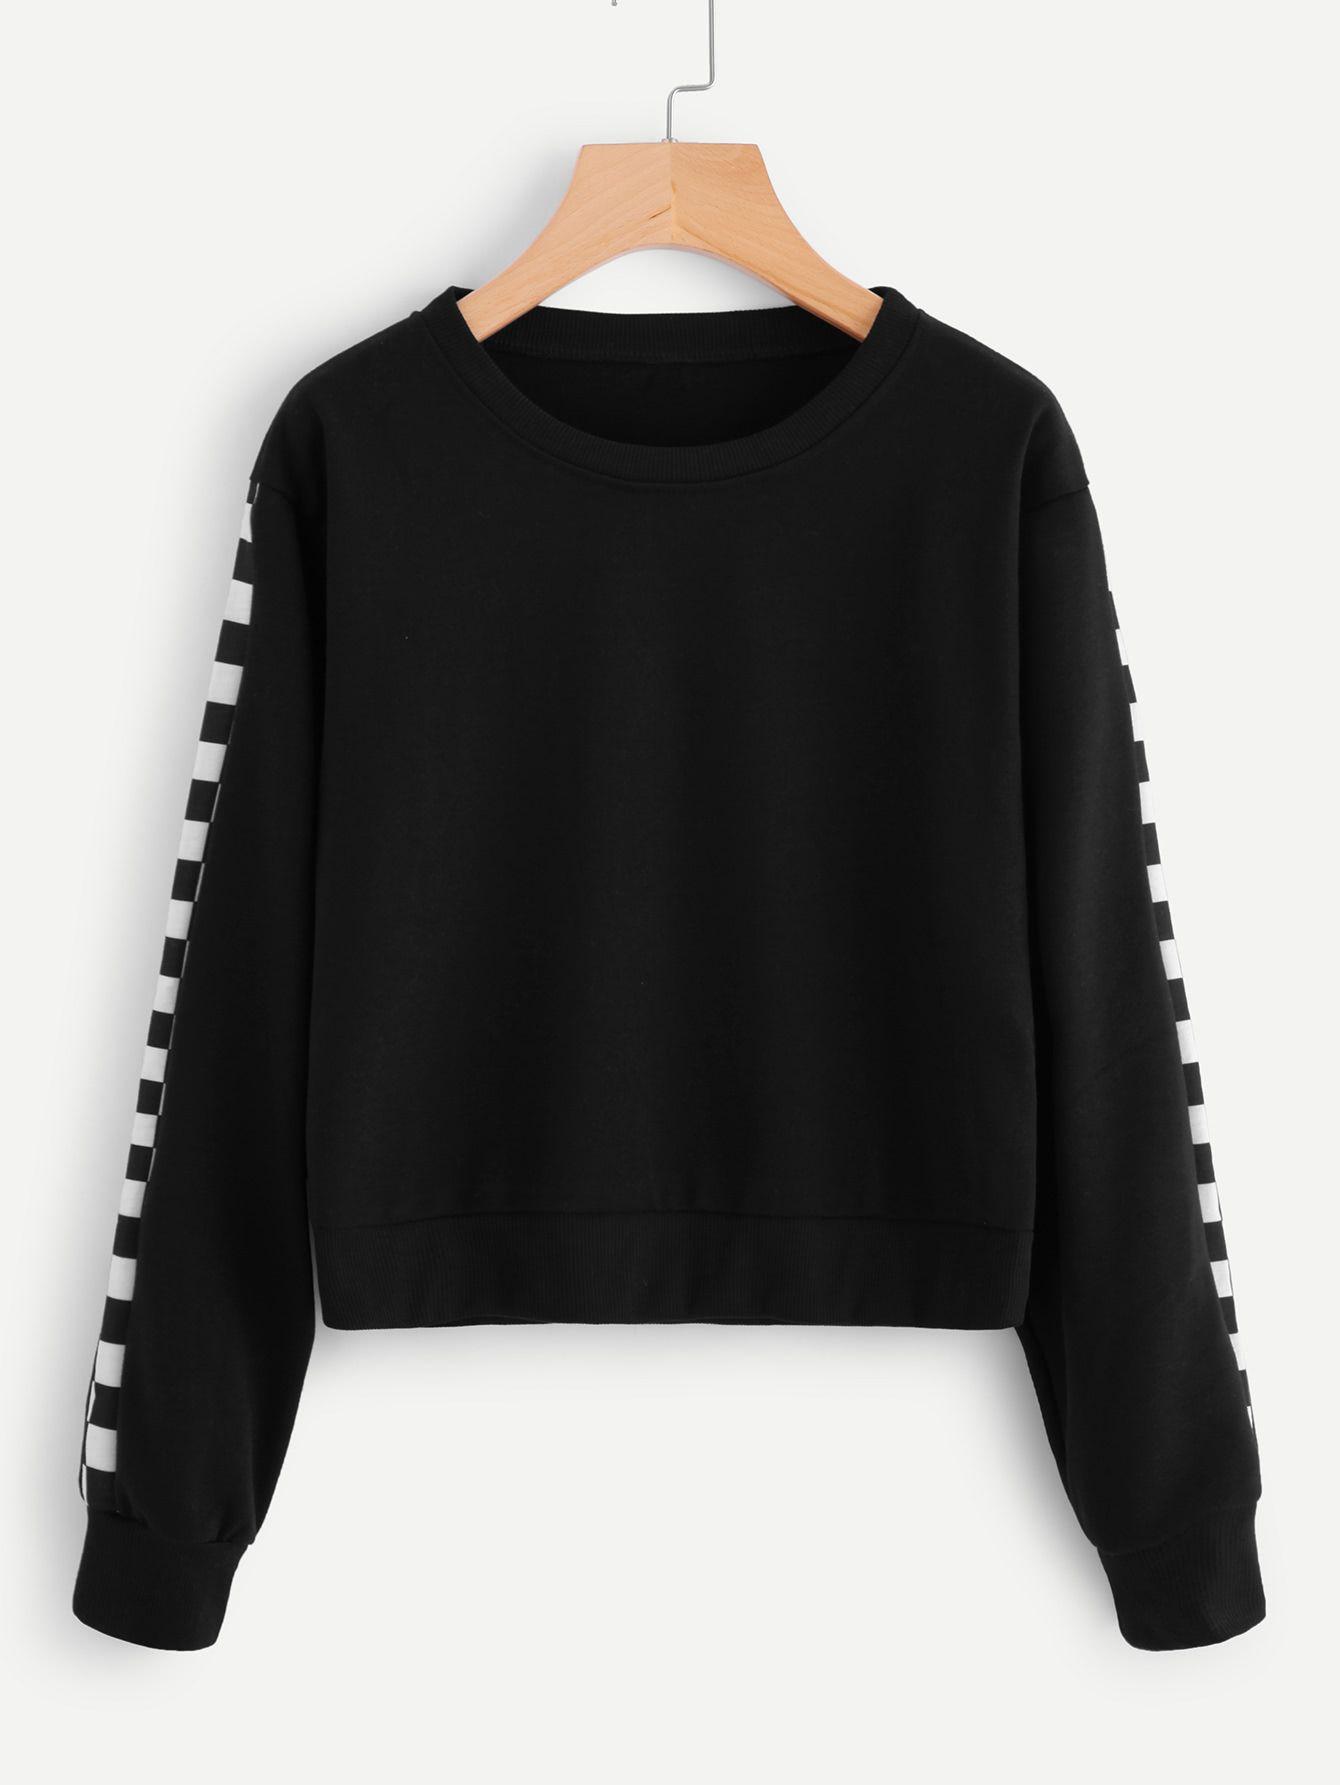 Contrast Checked Sleeve SweatshirtFor Women-romwe